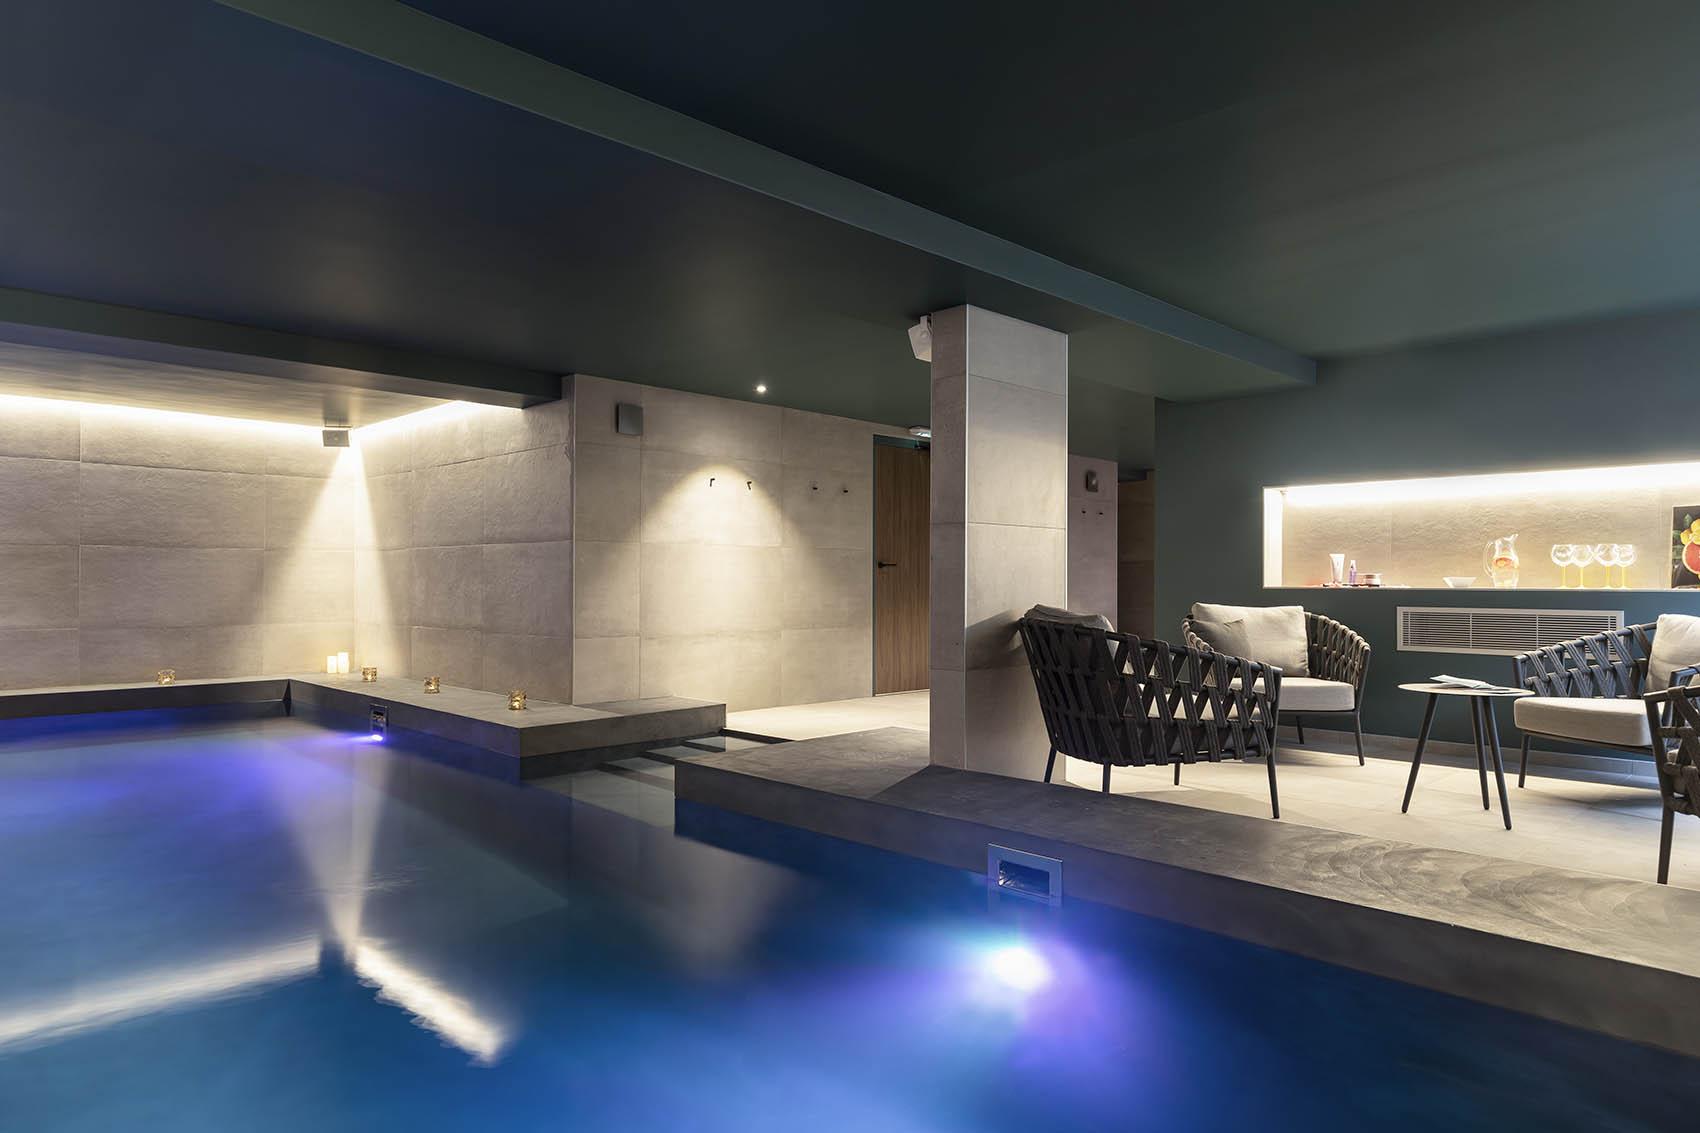 spa annecy black bass hotel. Black Bedroom Furniture Sets. Home Design Ideas